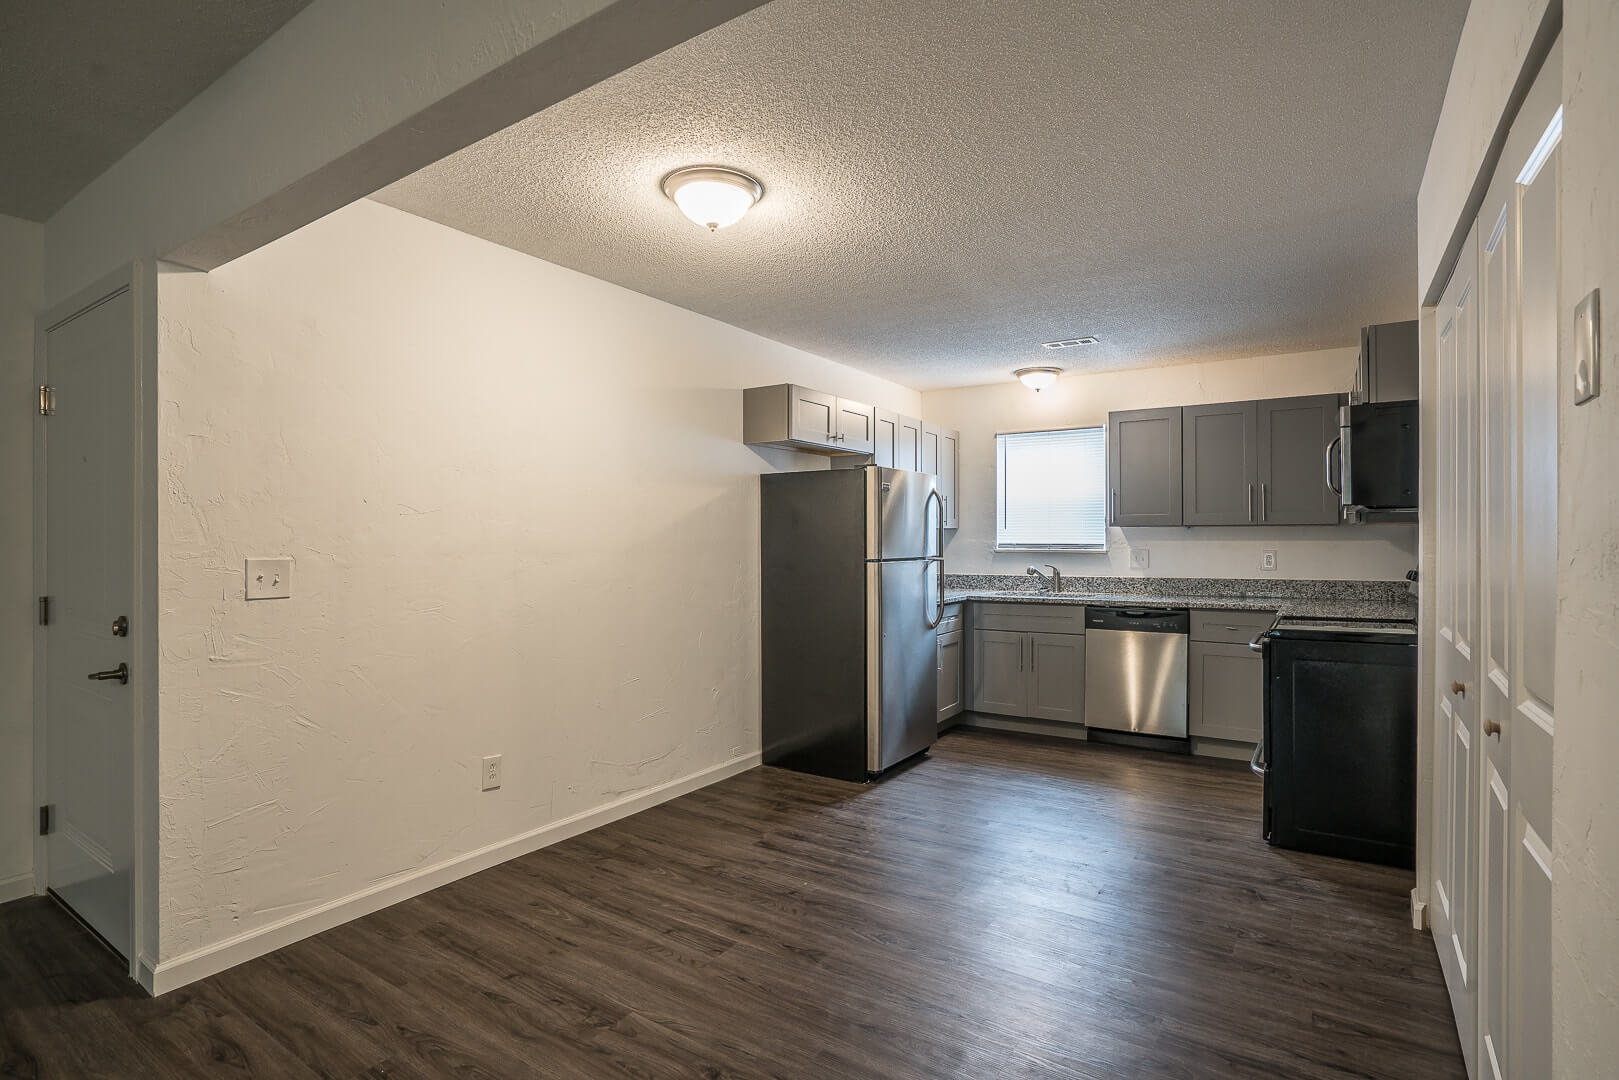 2 Bedroom Apartments O'Fallon